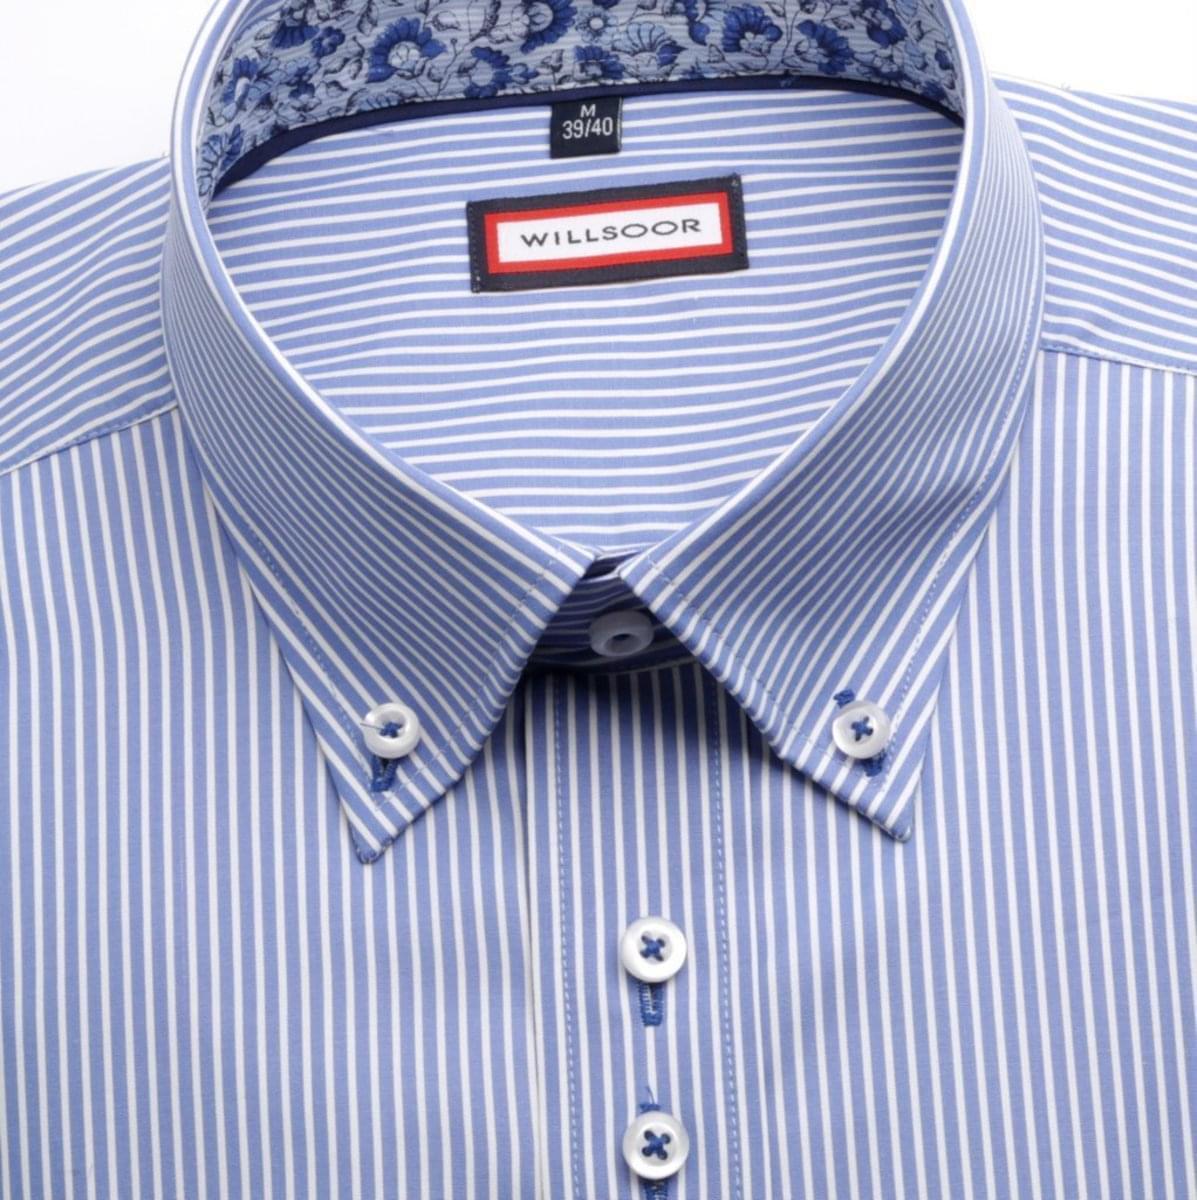 Košile WR Classic (výška 176-182)3932 176-182 / XL (43/44)